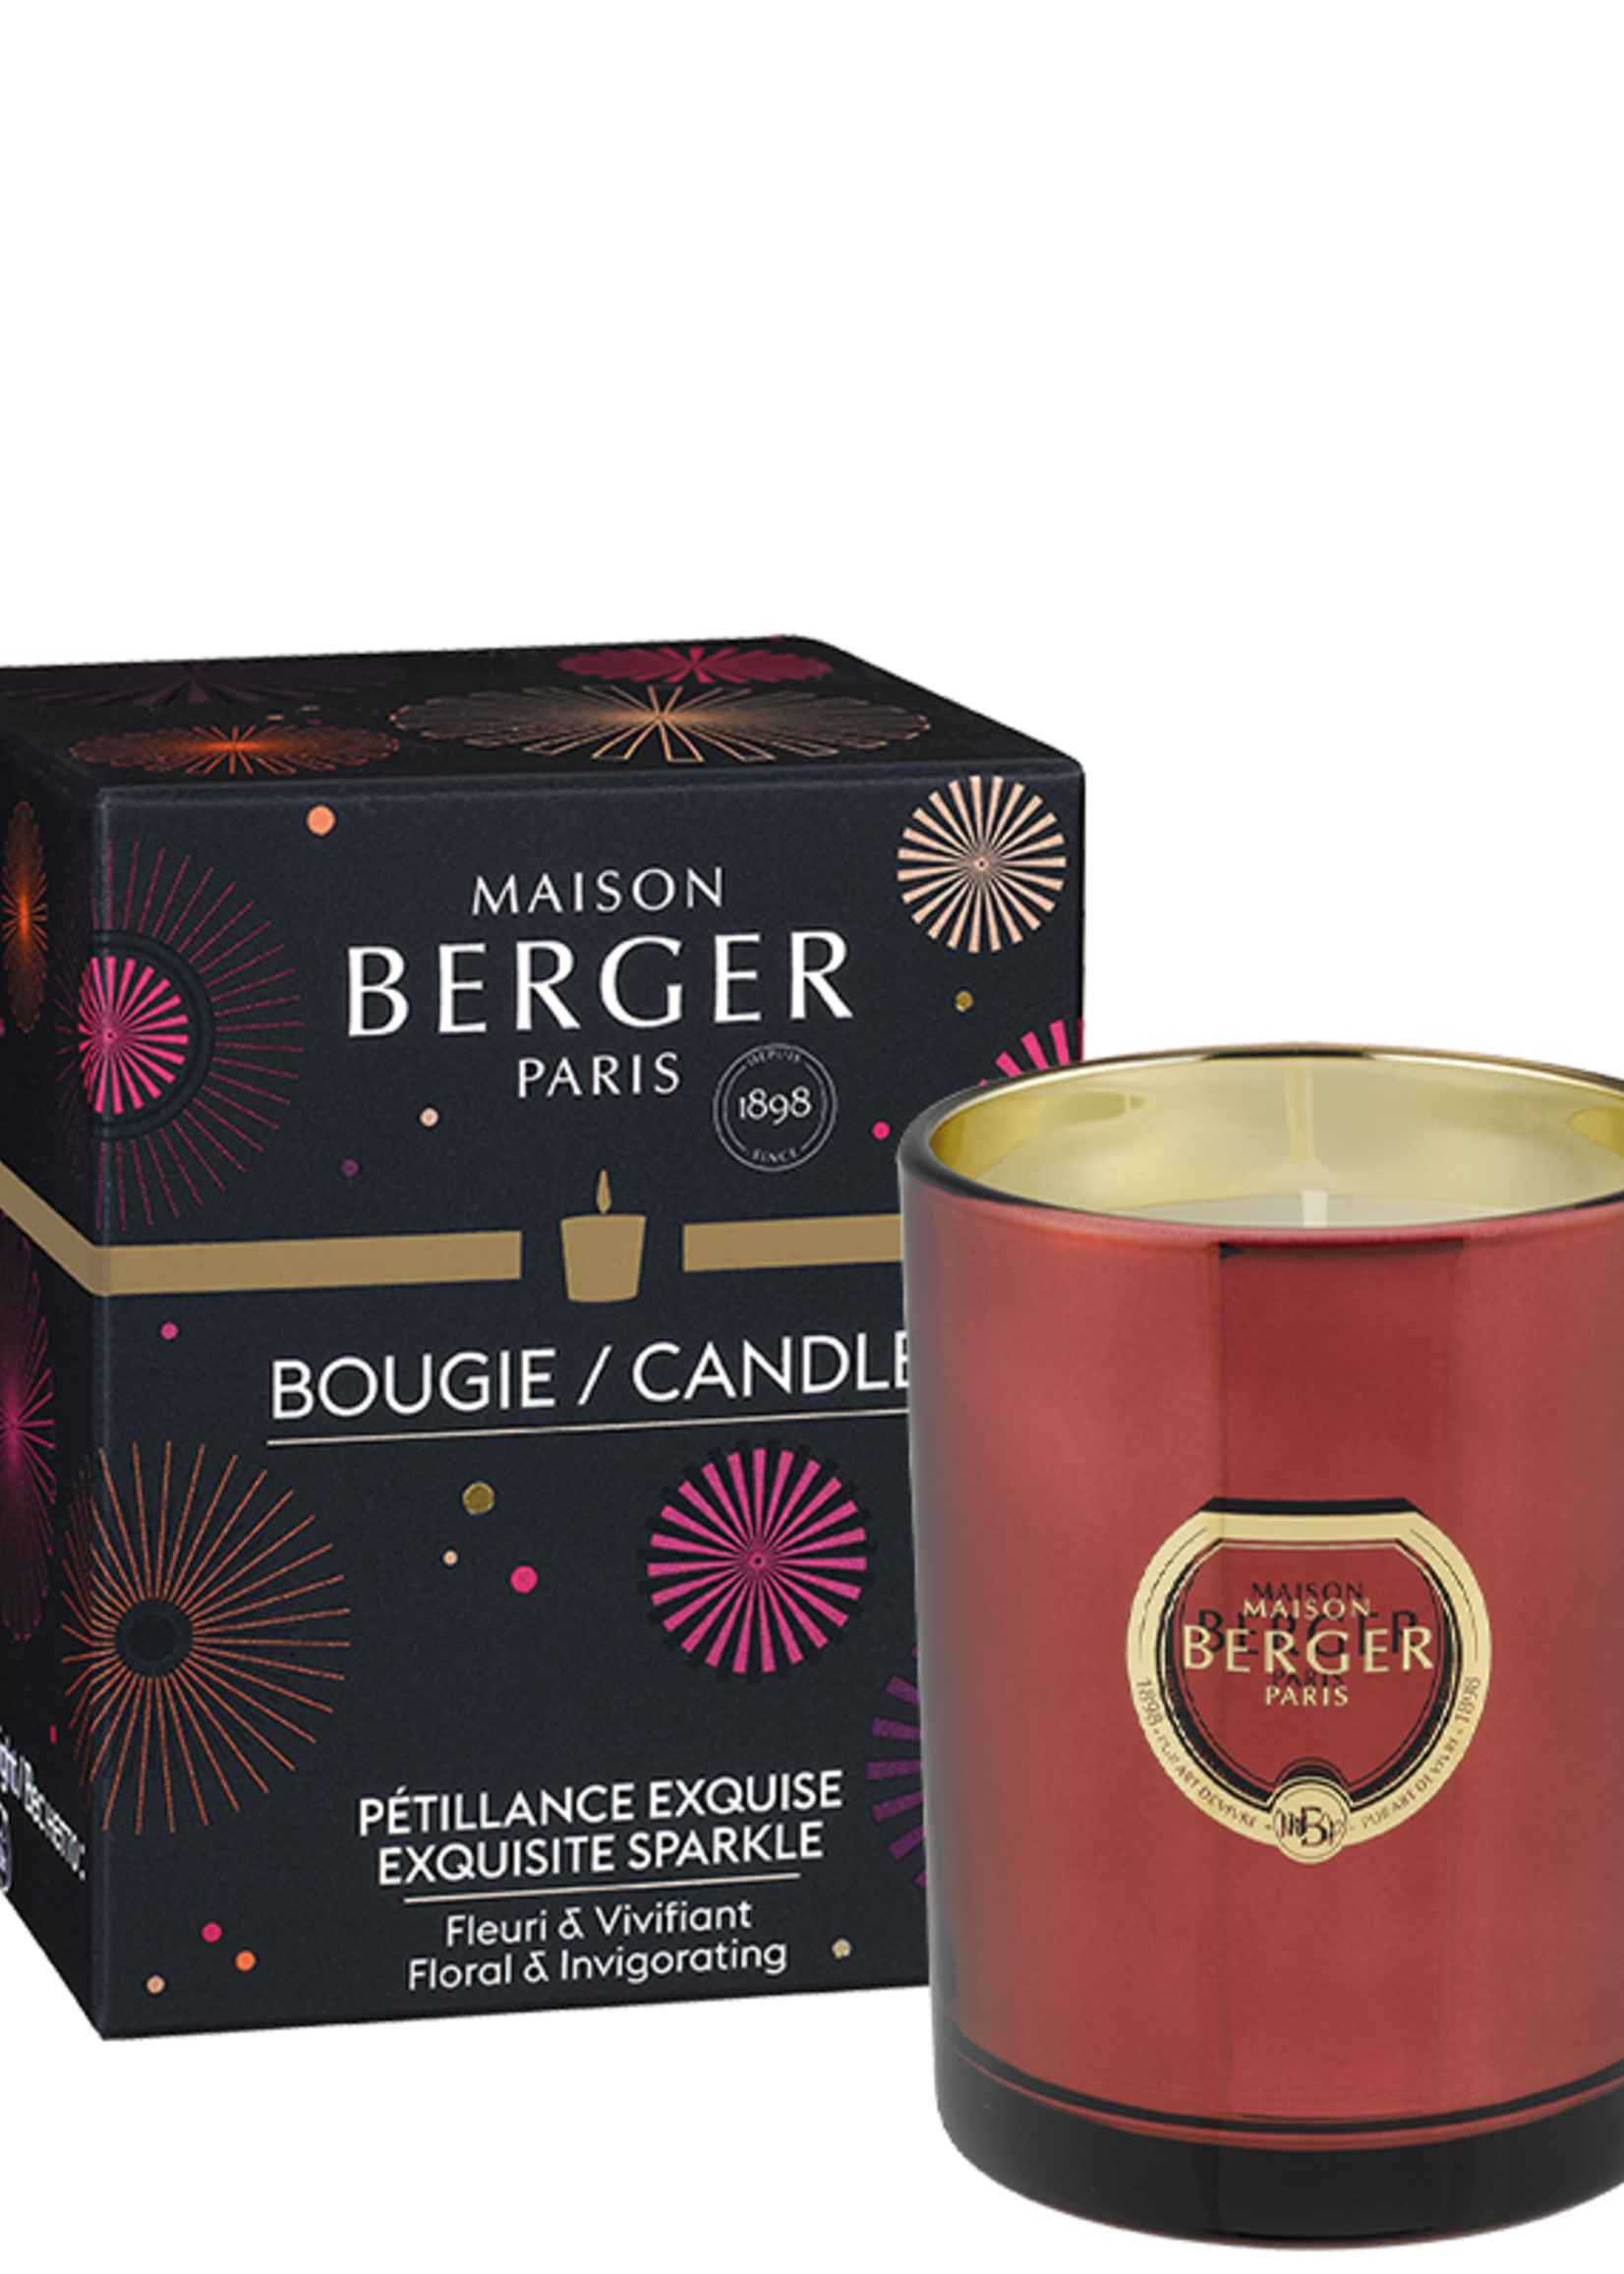 Lampe Berger Geurkaars Cercle Pétillance Exquise